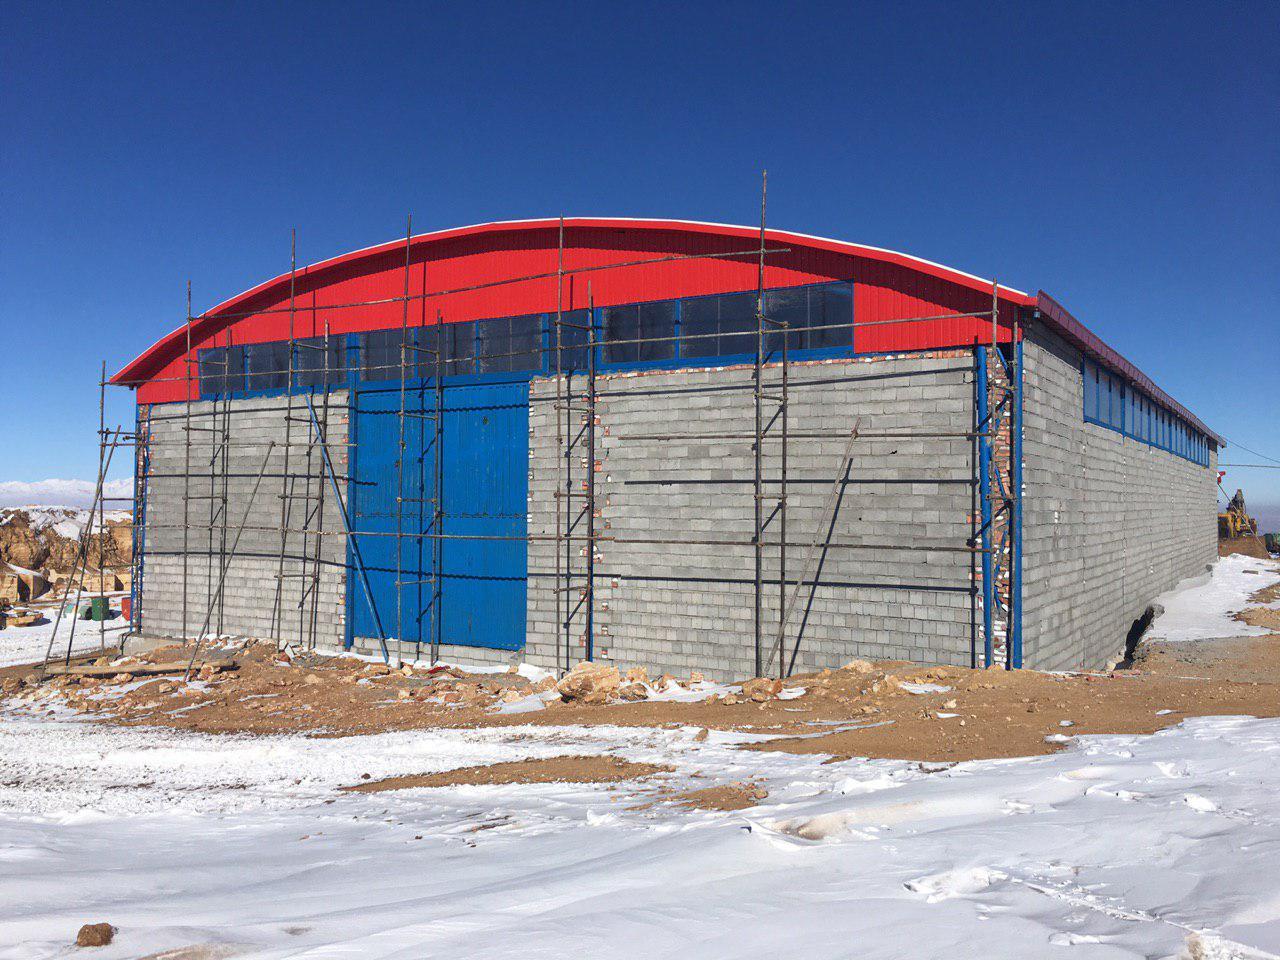 industrial shed 54 - آشنایی کامل با سوله و انواع مختلف آن | سوله سبک بیستون